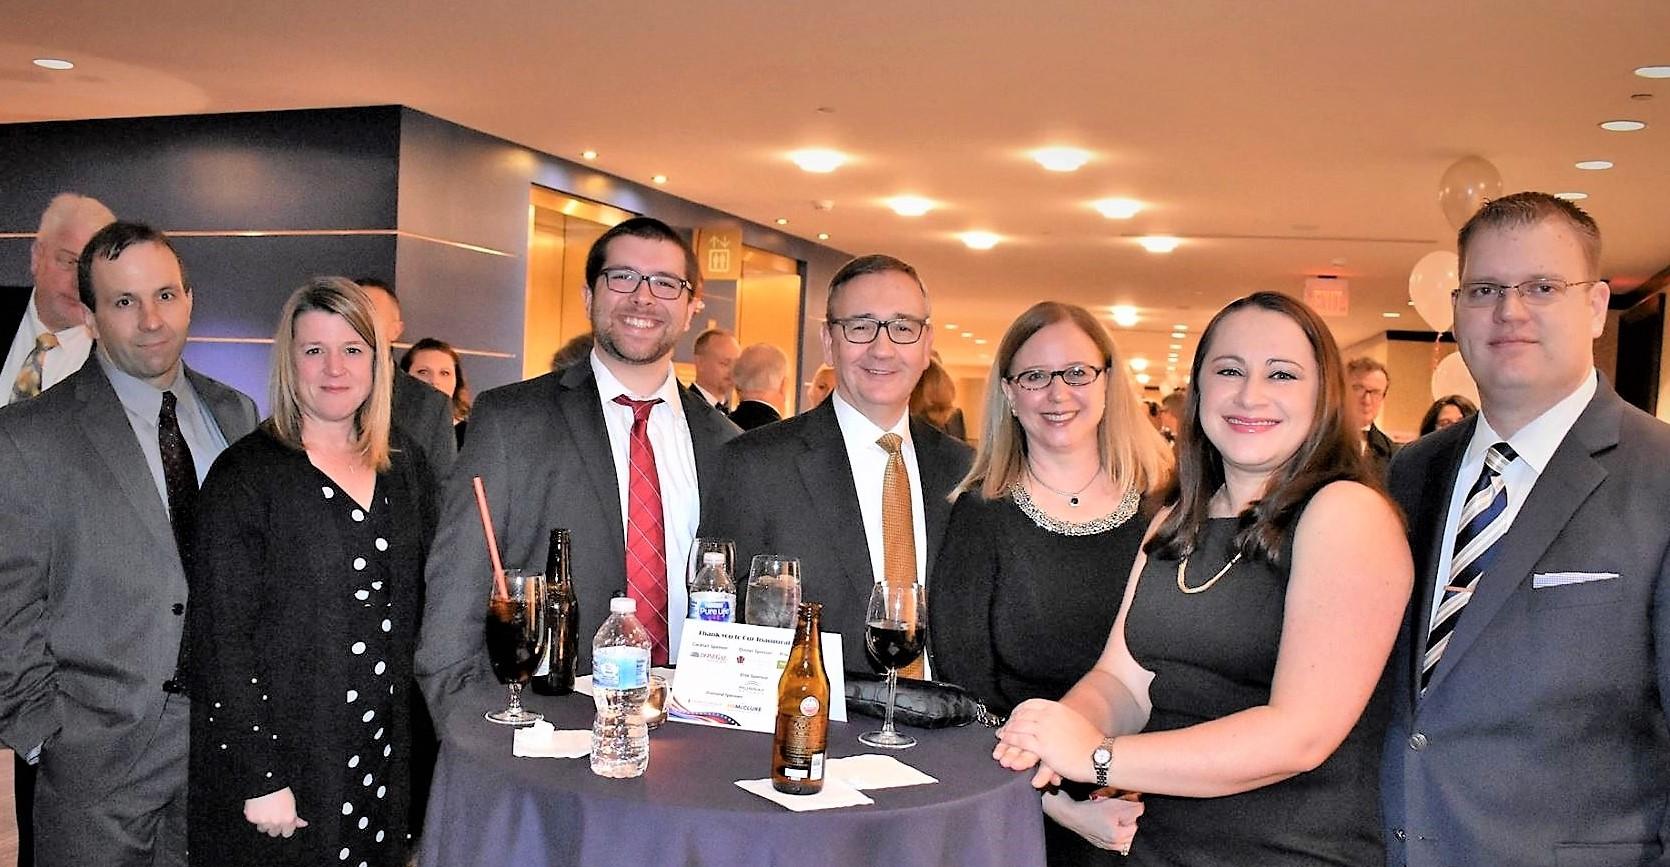 TEG Professionals Attend the 2019 ABC Keystone Inaugural Gala